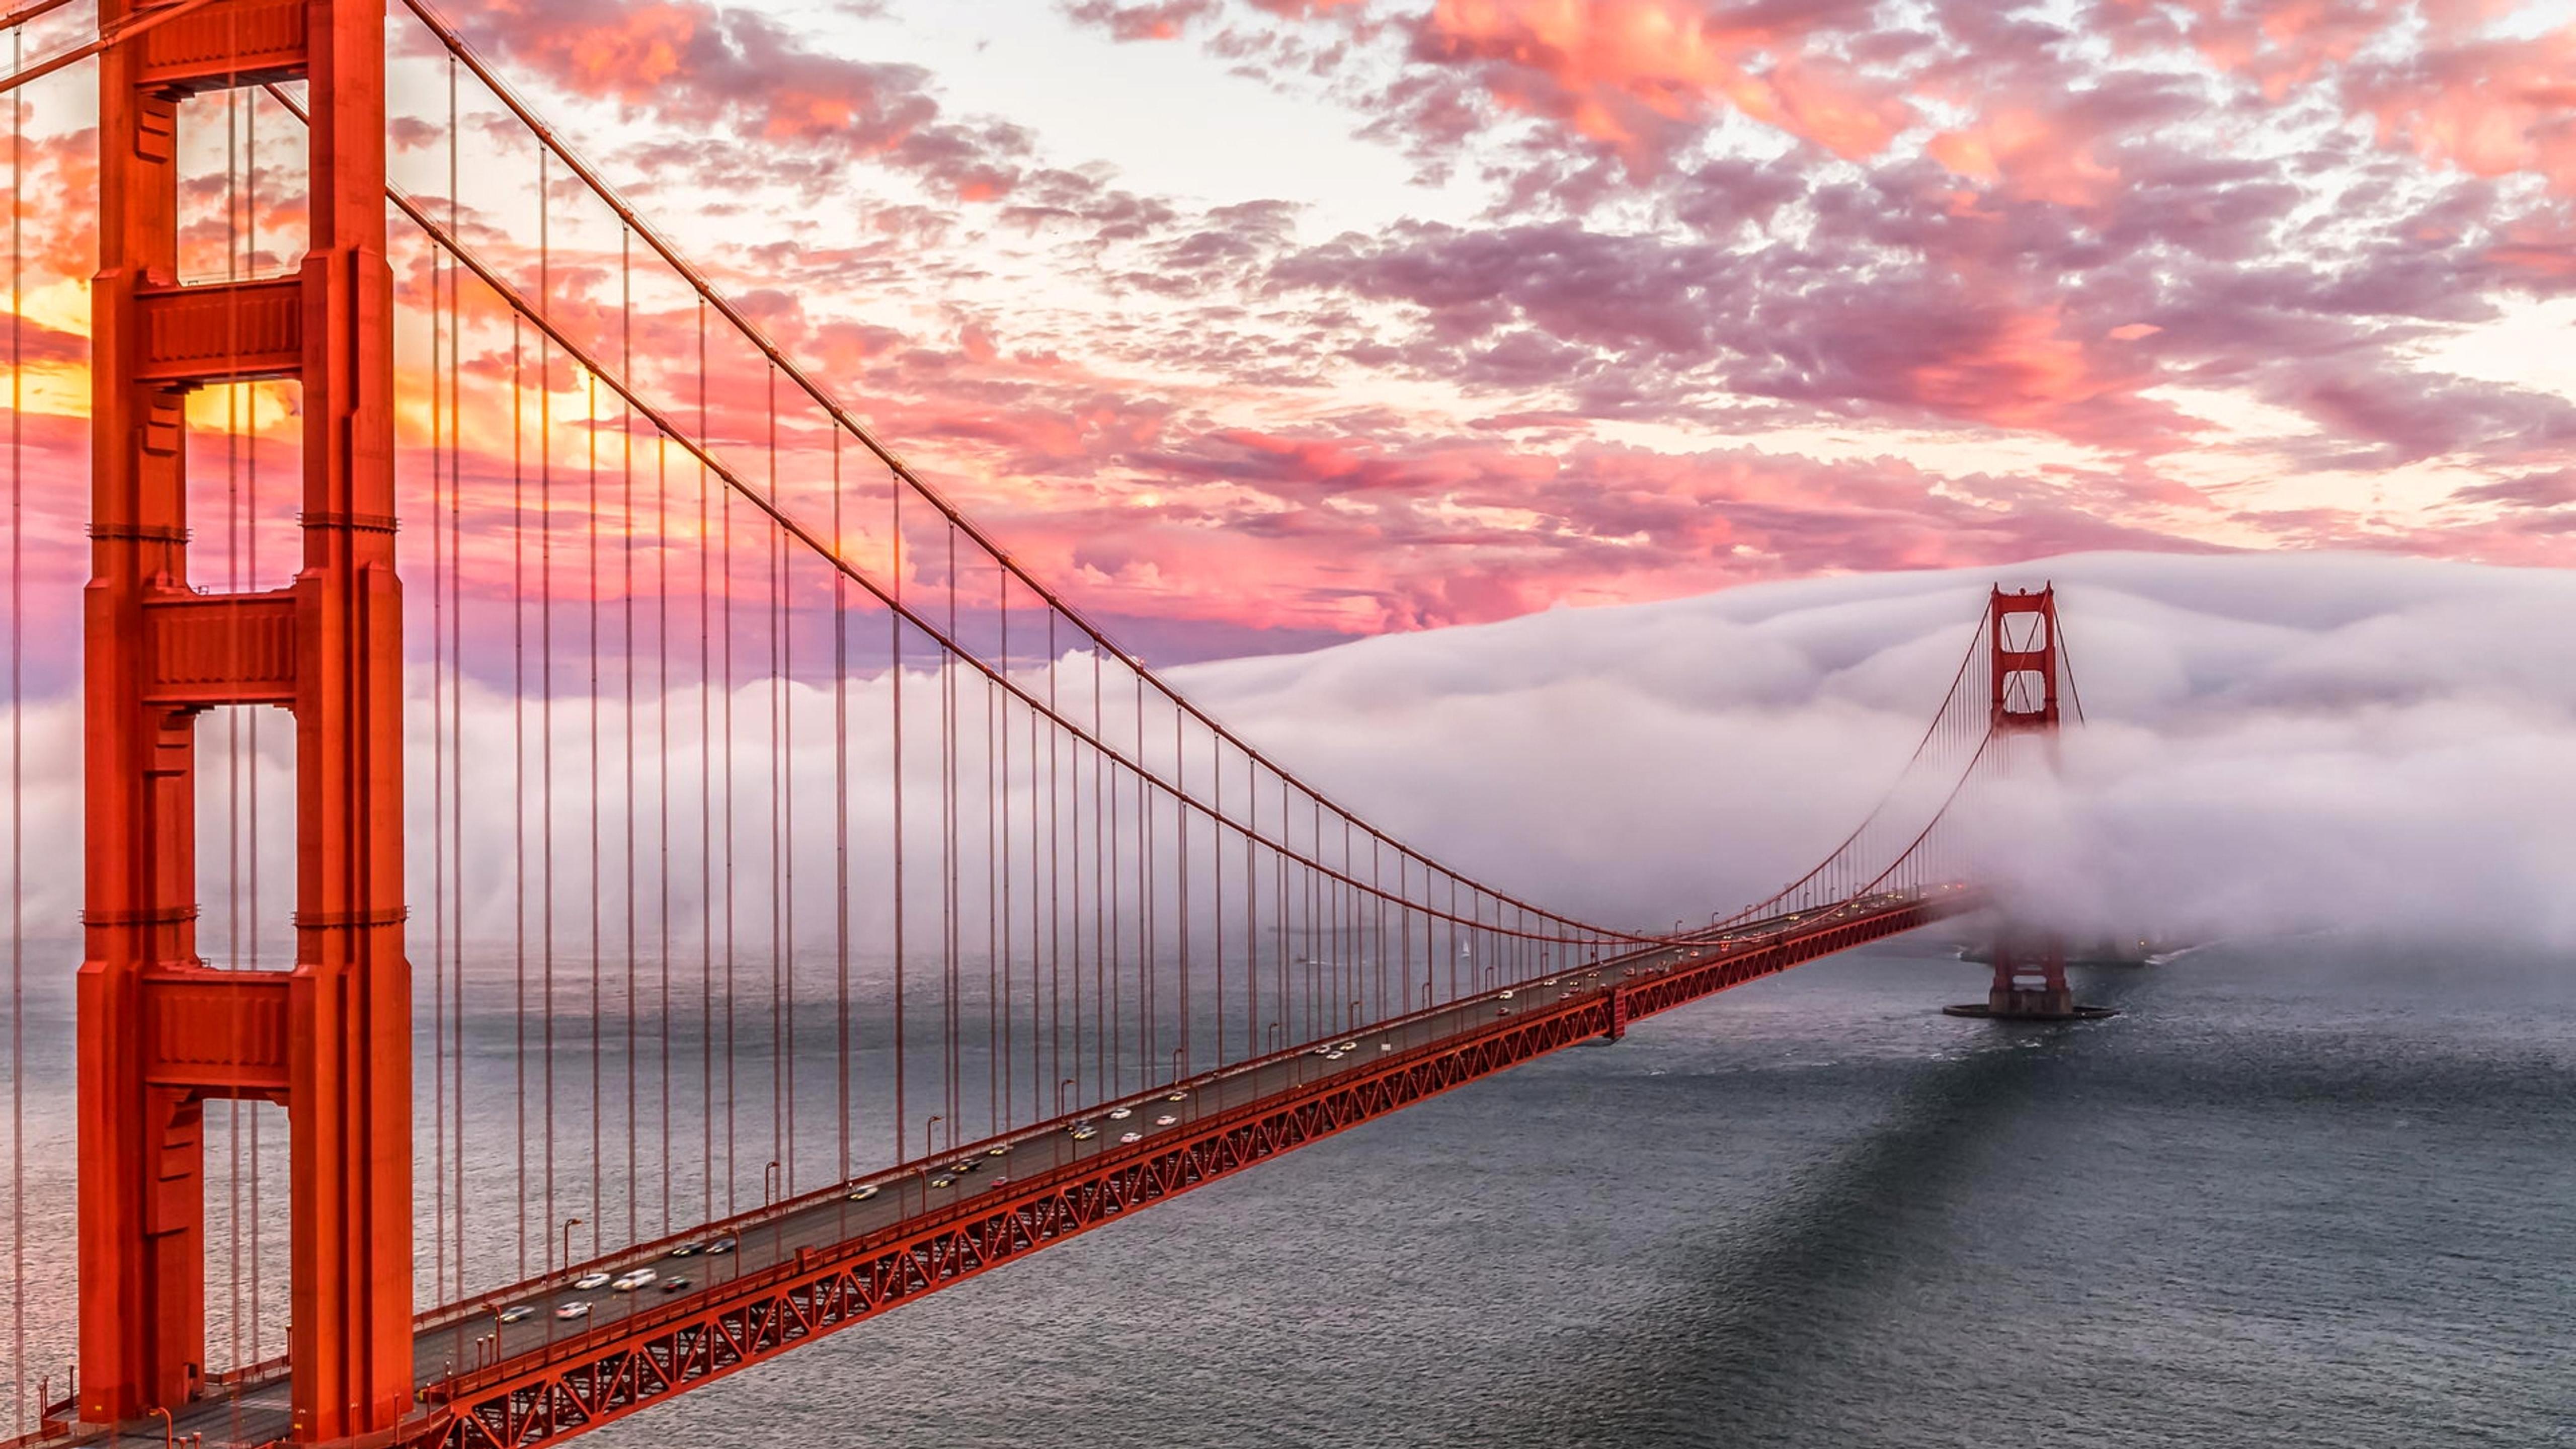 Golden Gate Bridge in fog in San Francisco Wallpaper ...